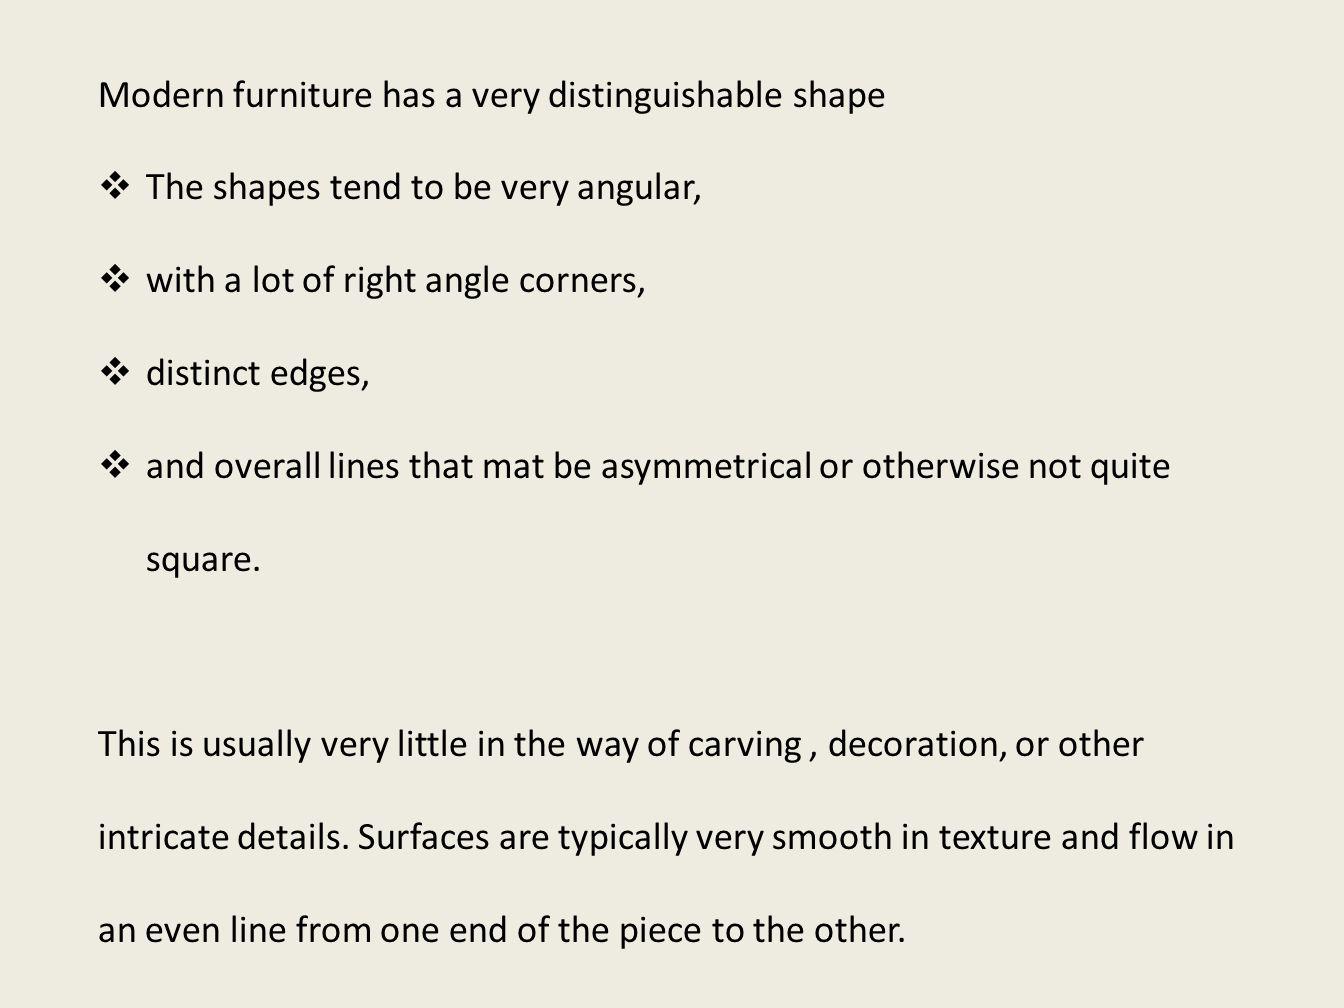 Modern furniture has a very distinguishable shape